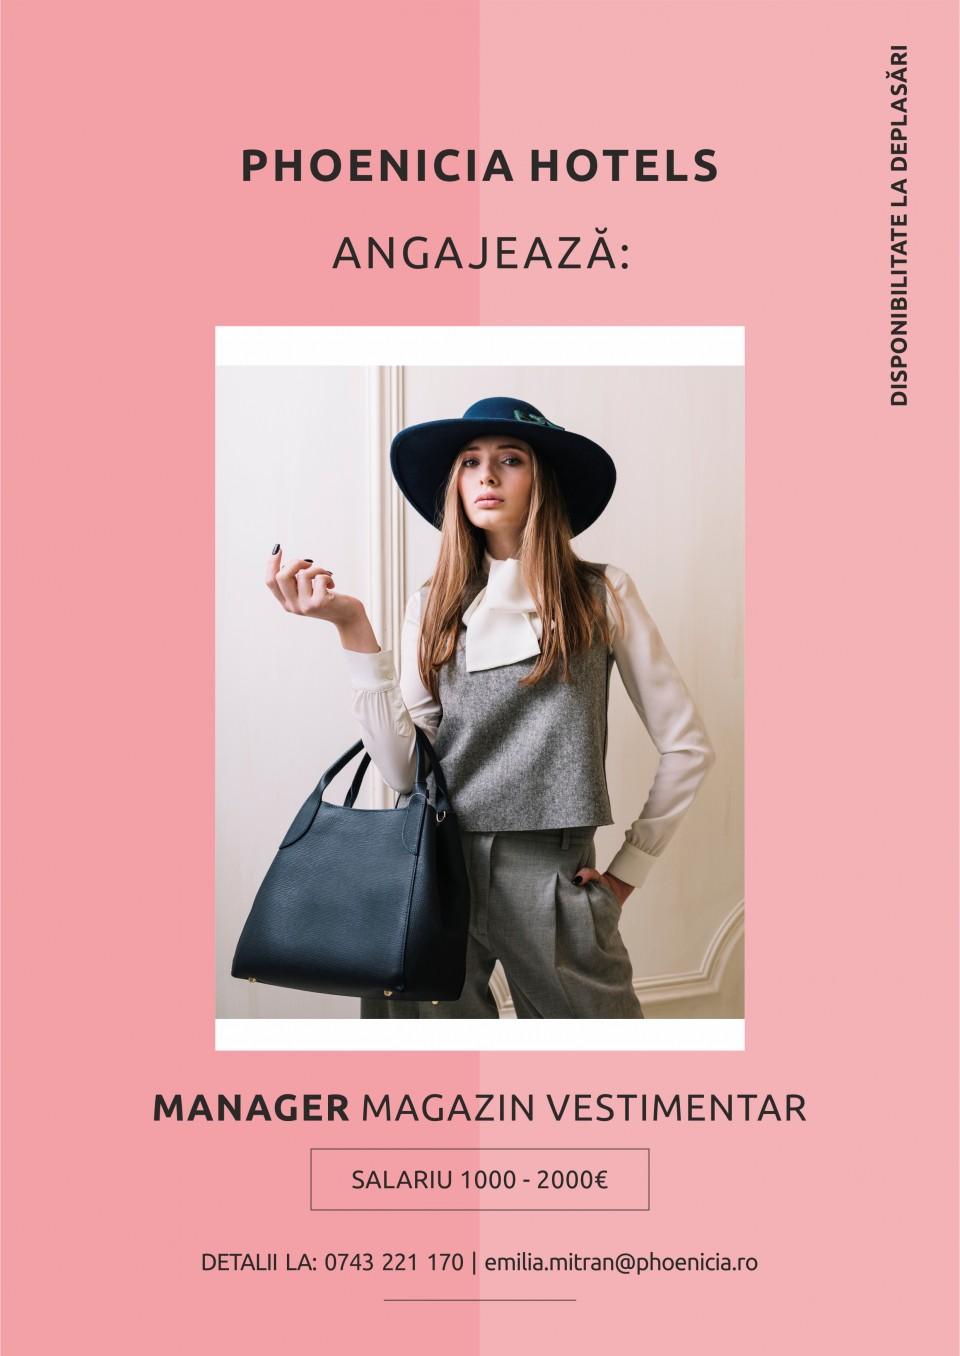 Manager Magazin Vestimentar